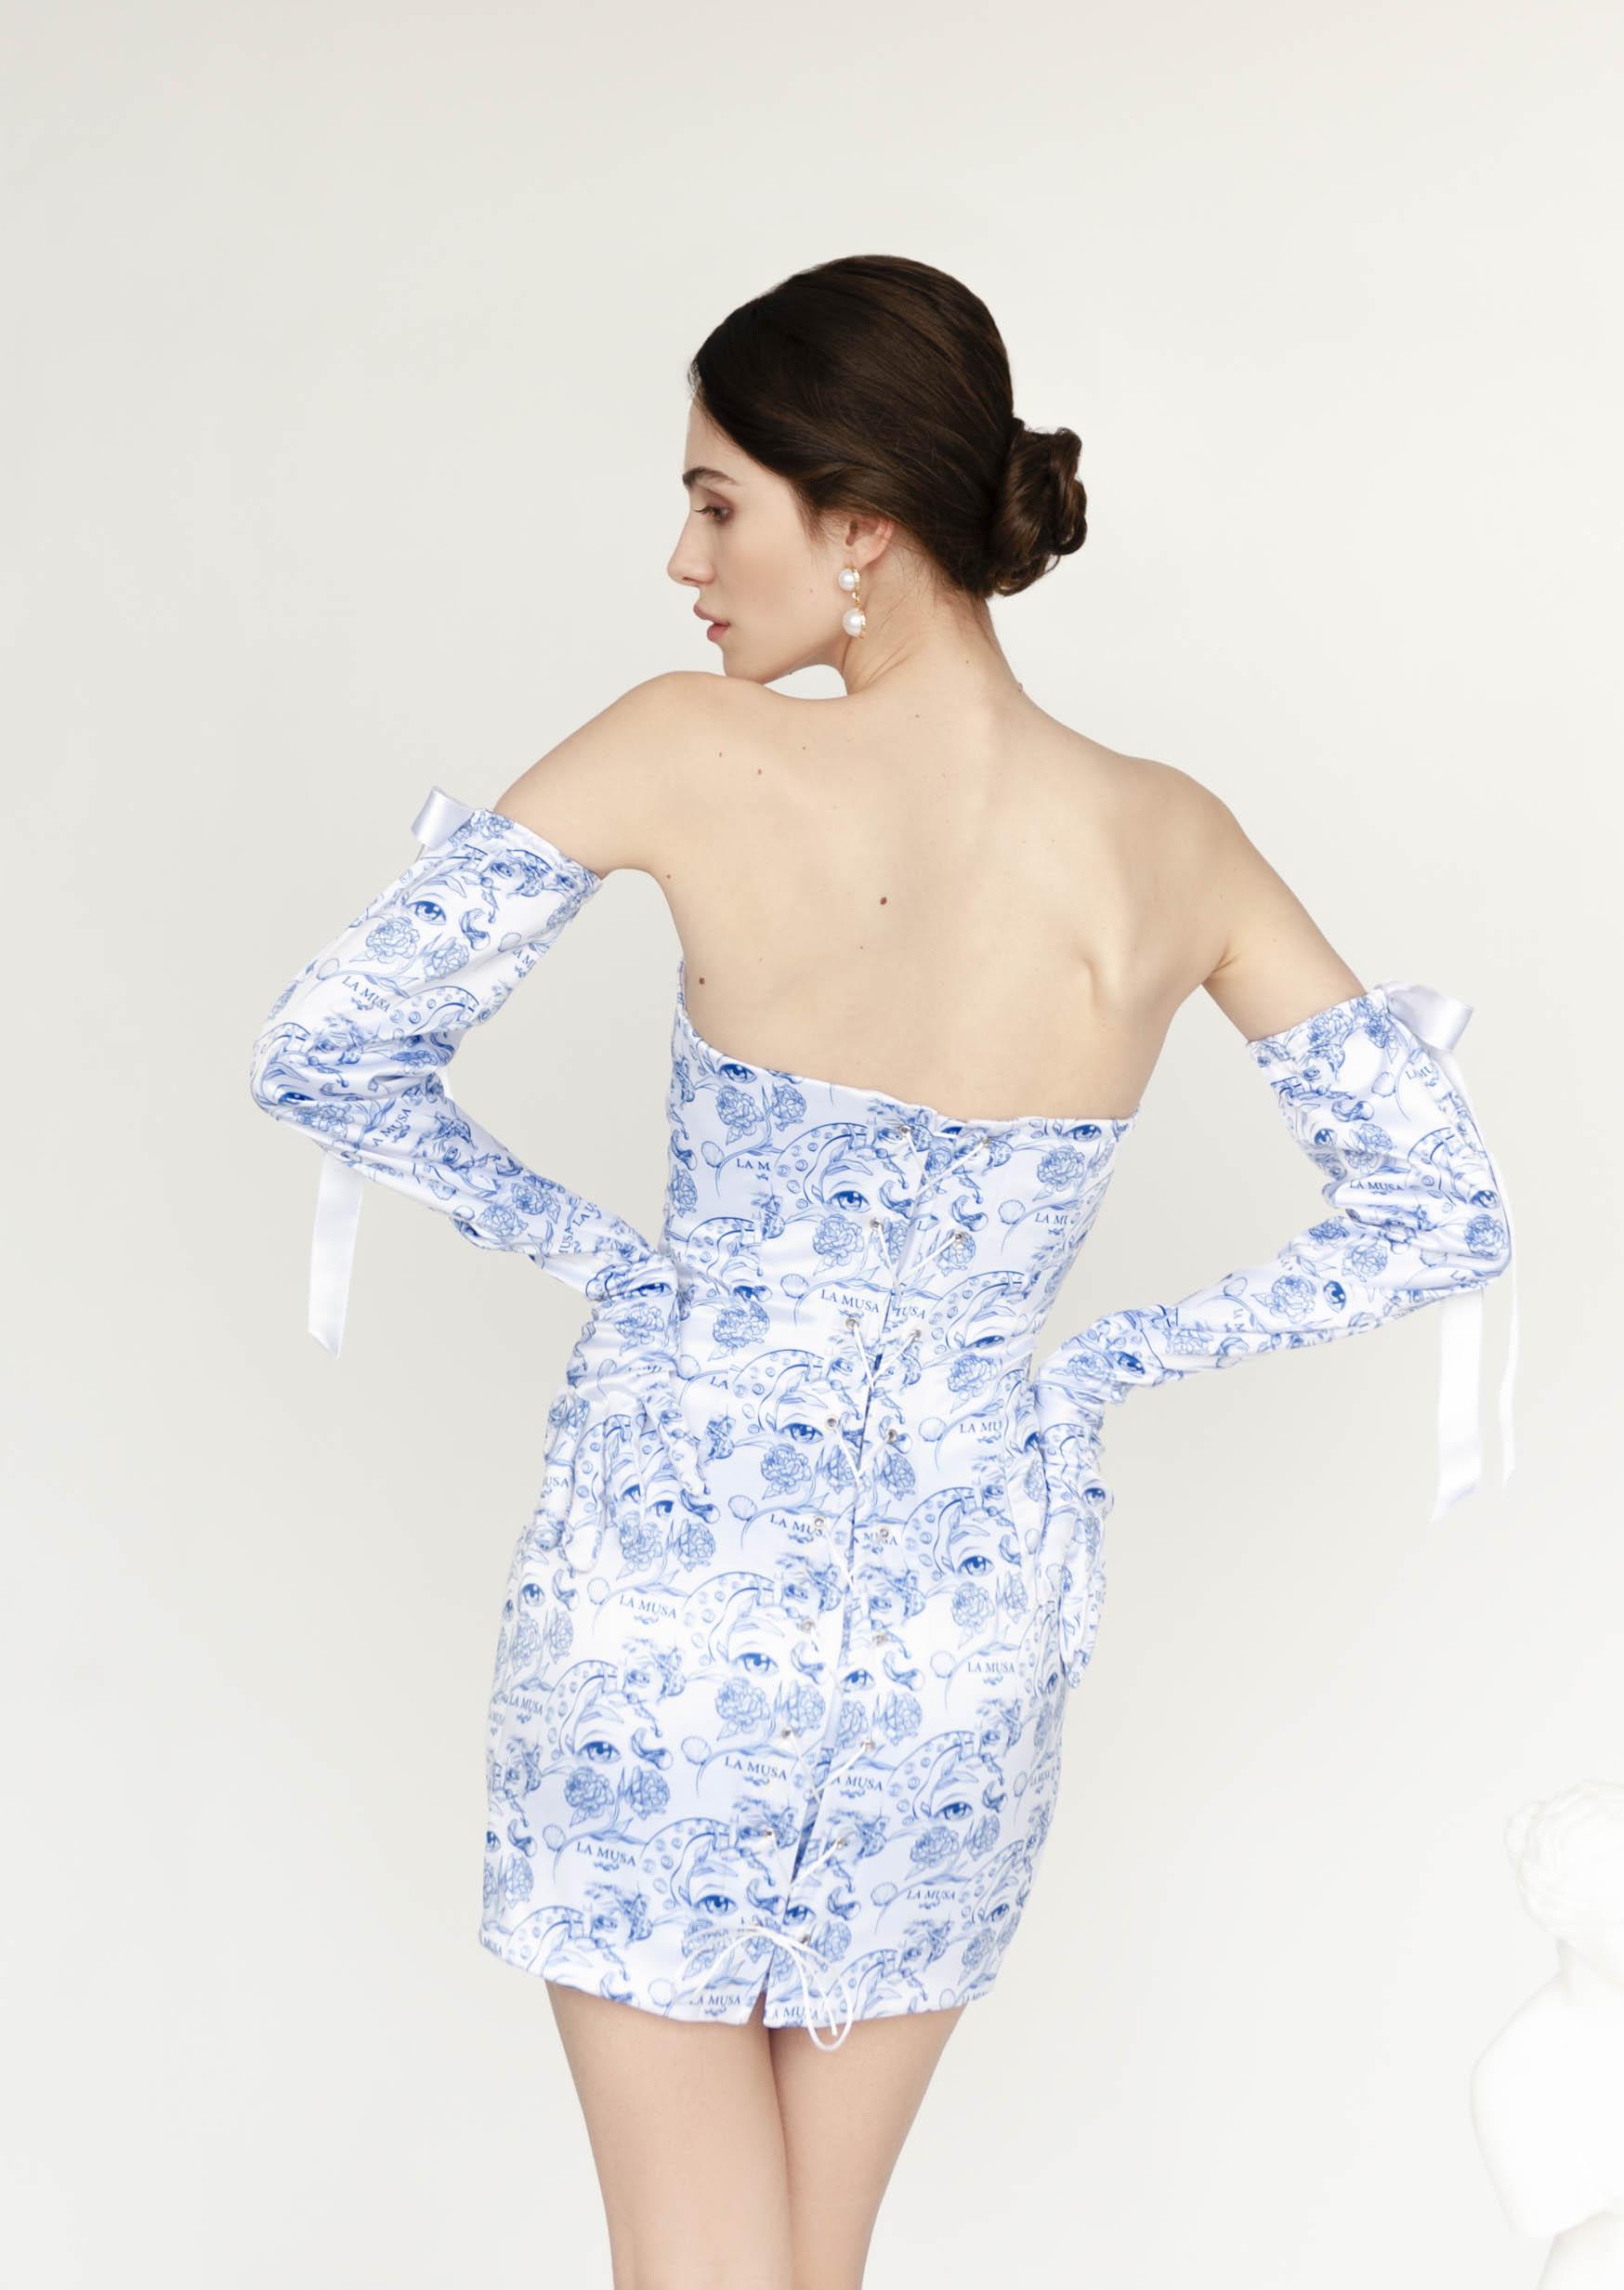 Porcelain doll dress blue corset wedding dress with gloves